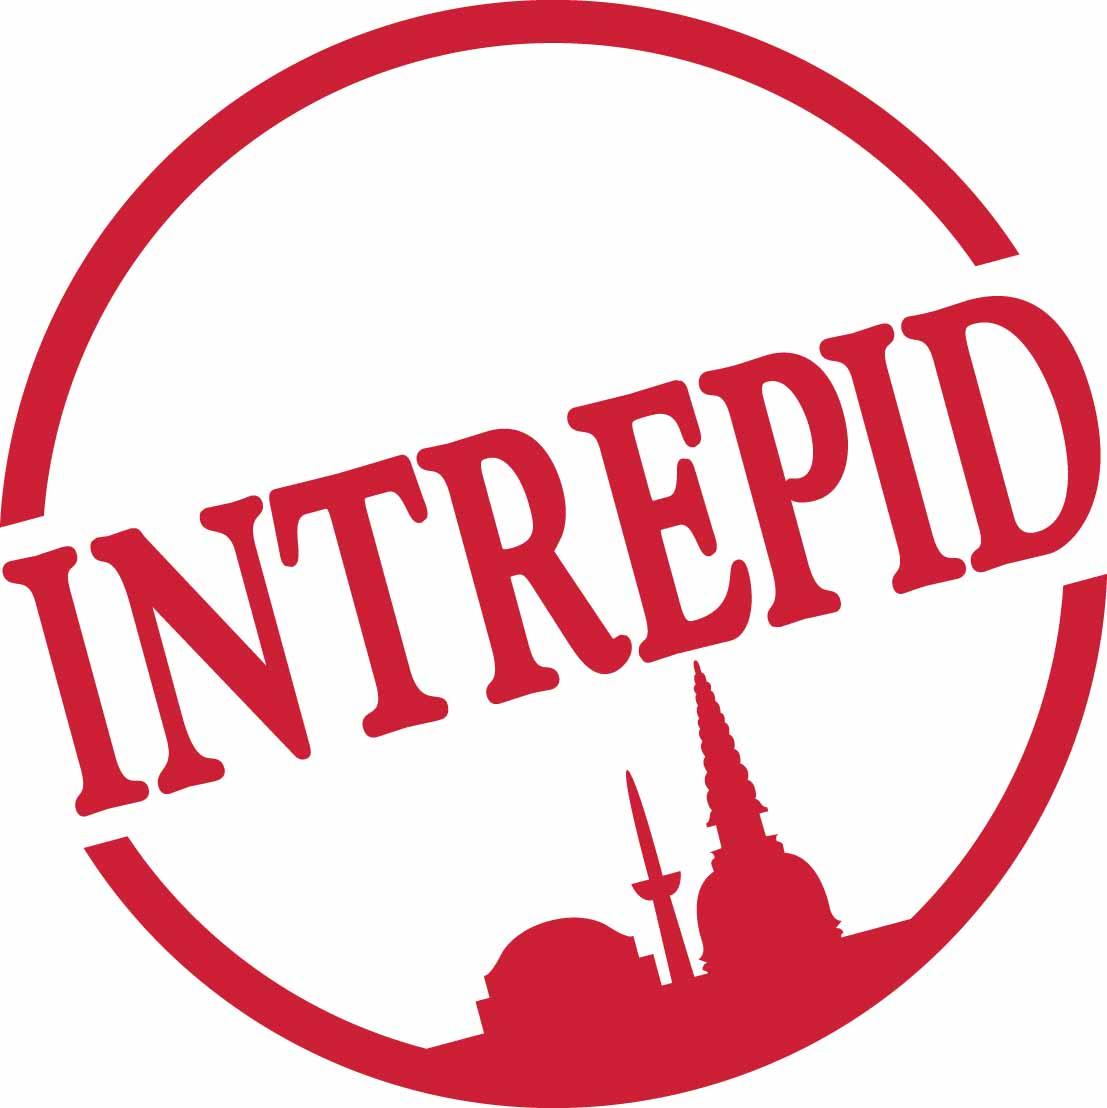 Intrepid logo